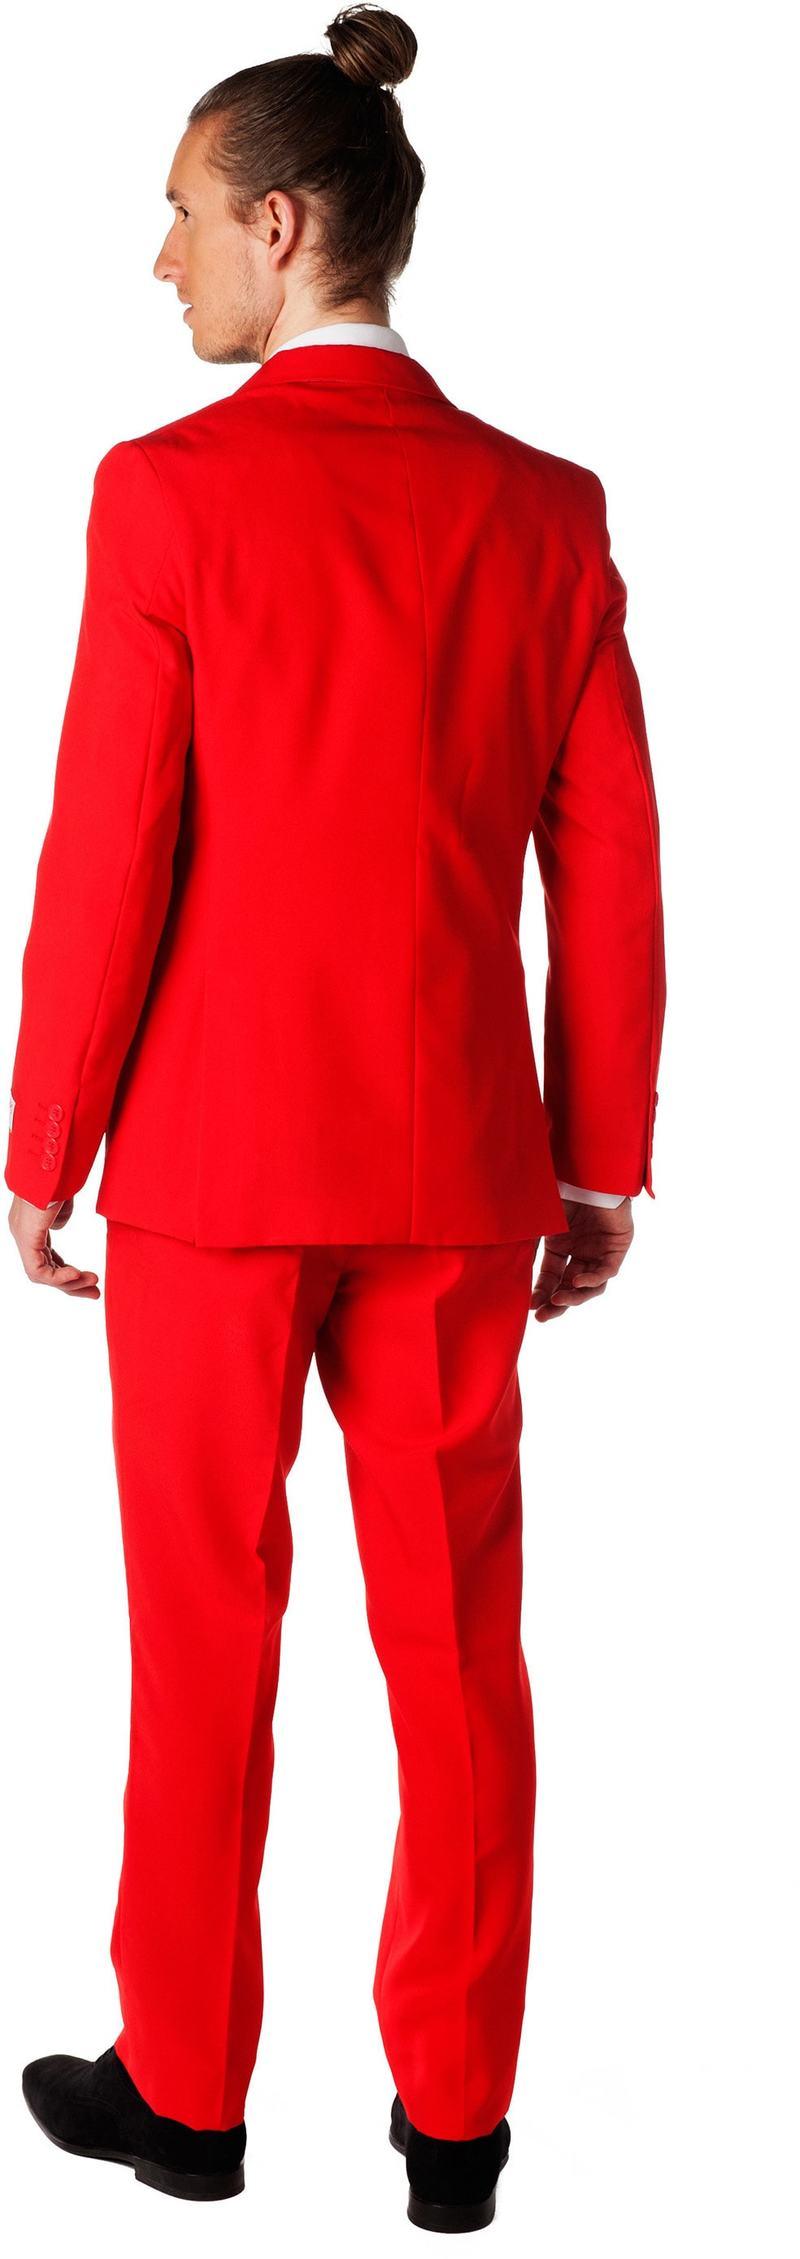 OppoSuits Red Devil Kostuum foto 1